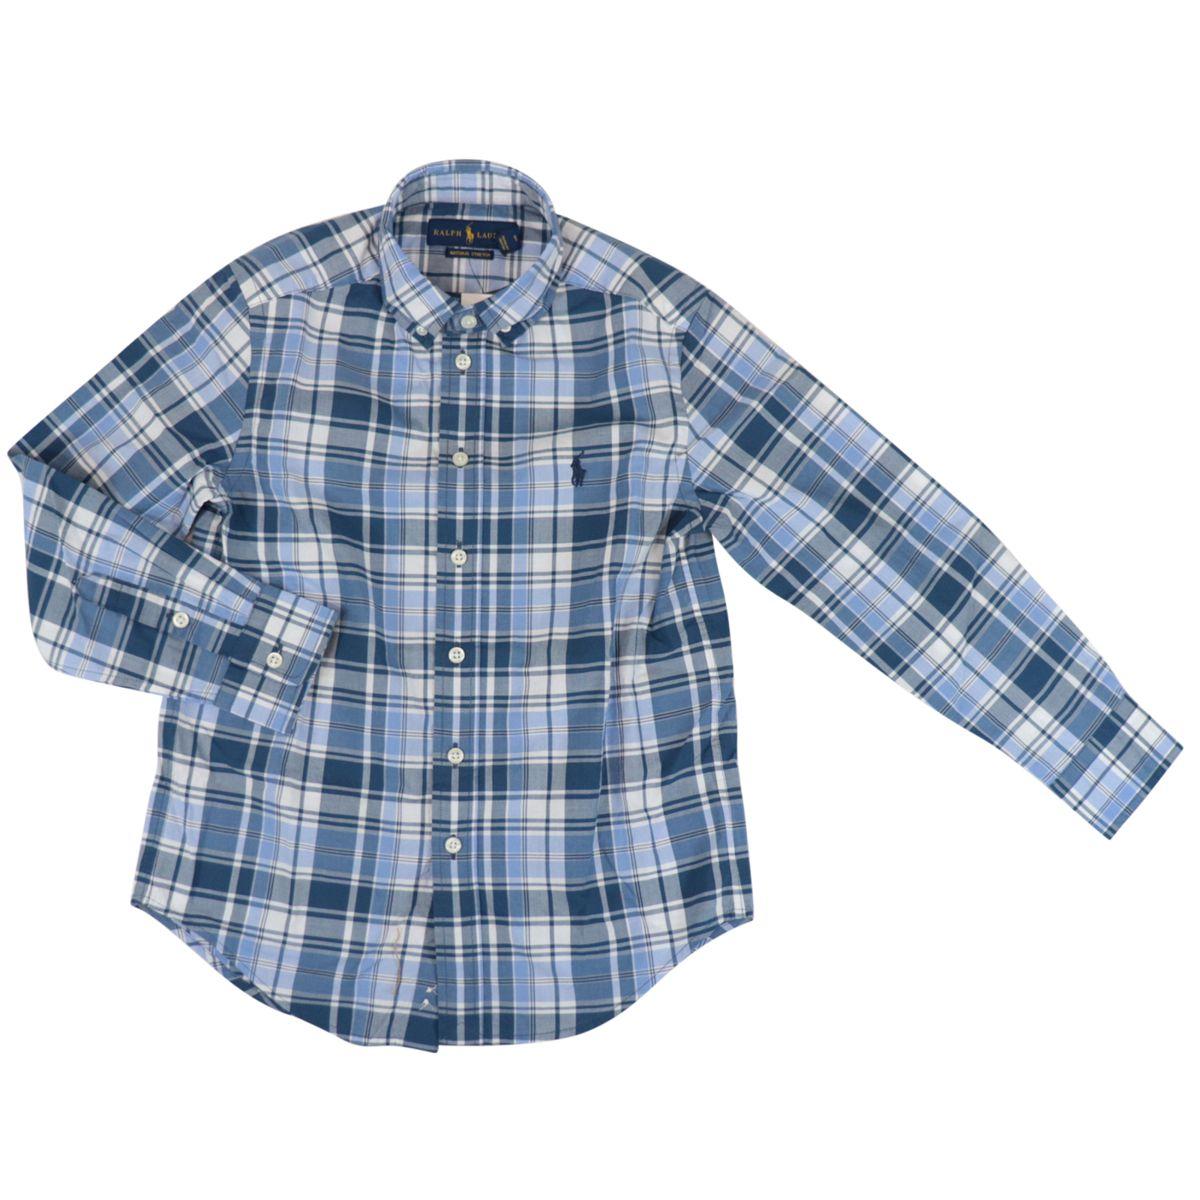 Botton down shirt in cotton with madras pattern Blue / white Polo Ralph Lauren